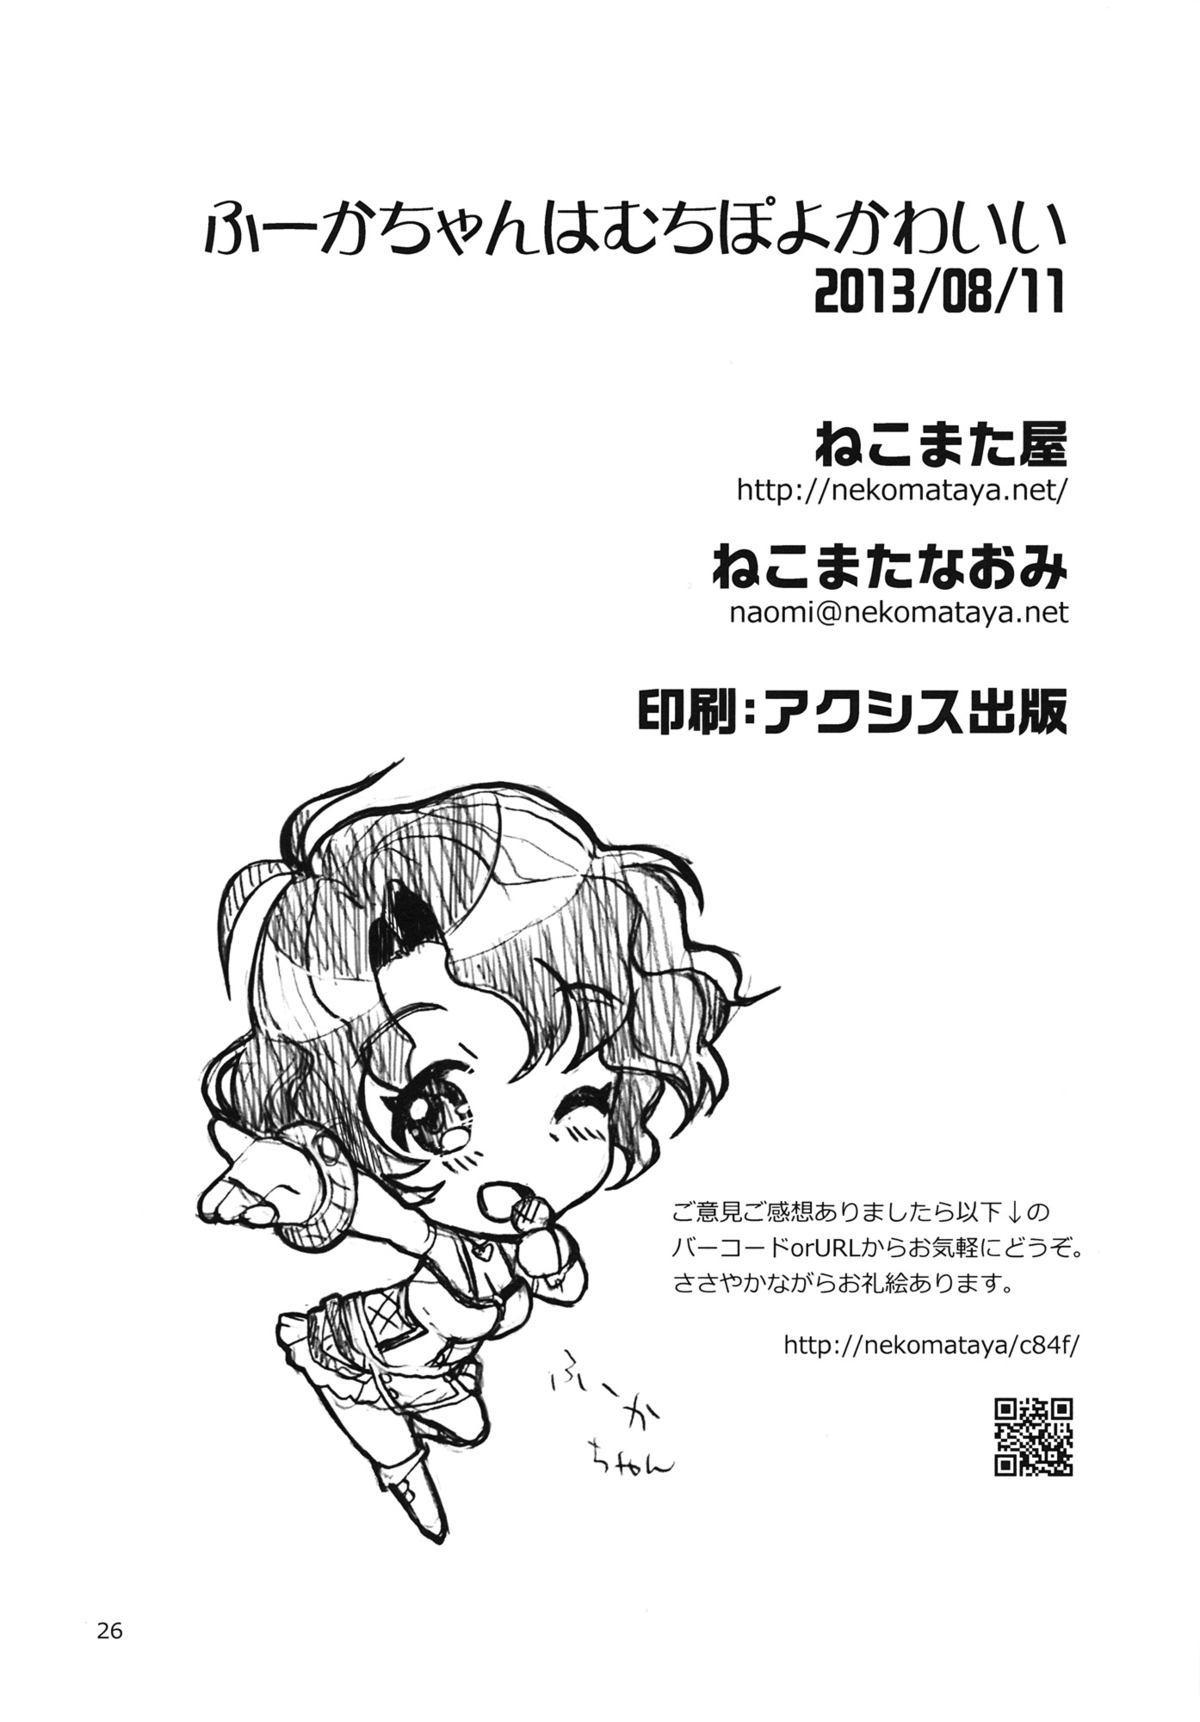 (C84) [Nekomataya (Nekomata Naomi)] Fuuka-chan wa Muchi Poyo Kawaii   Fuka-chan is Soft, Bouncy, and Cute (THE IDOLM@STER MILLION LIVE!) [English] {doujin-moe.us} 24